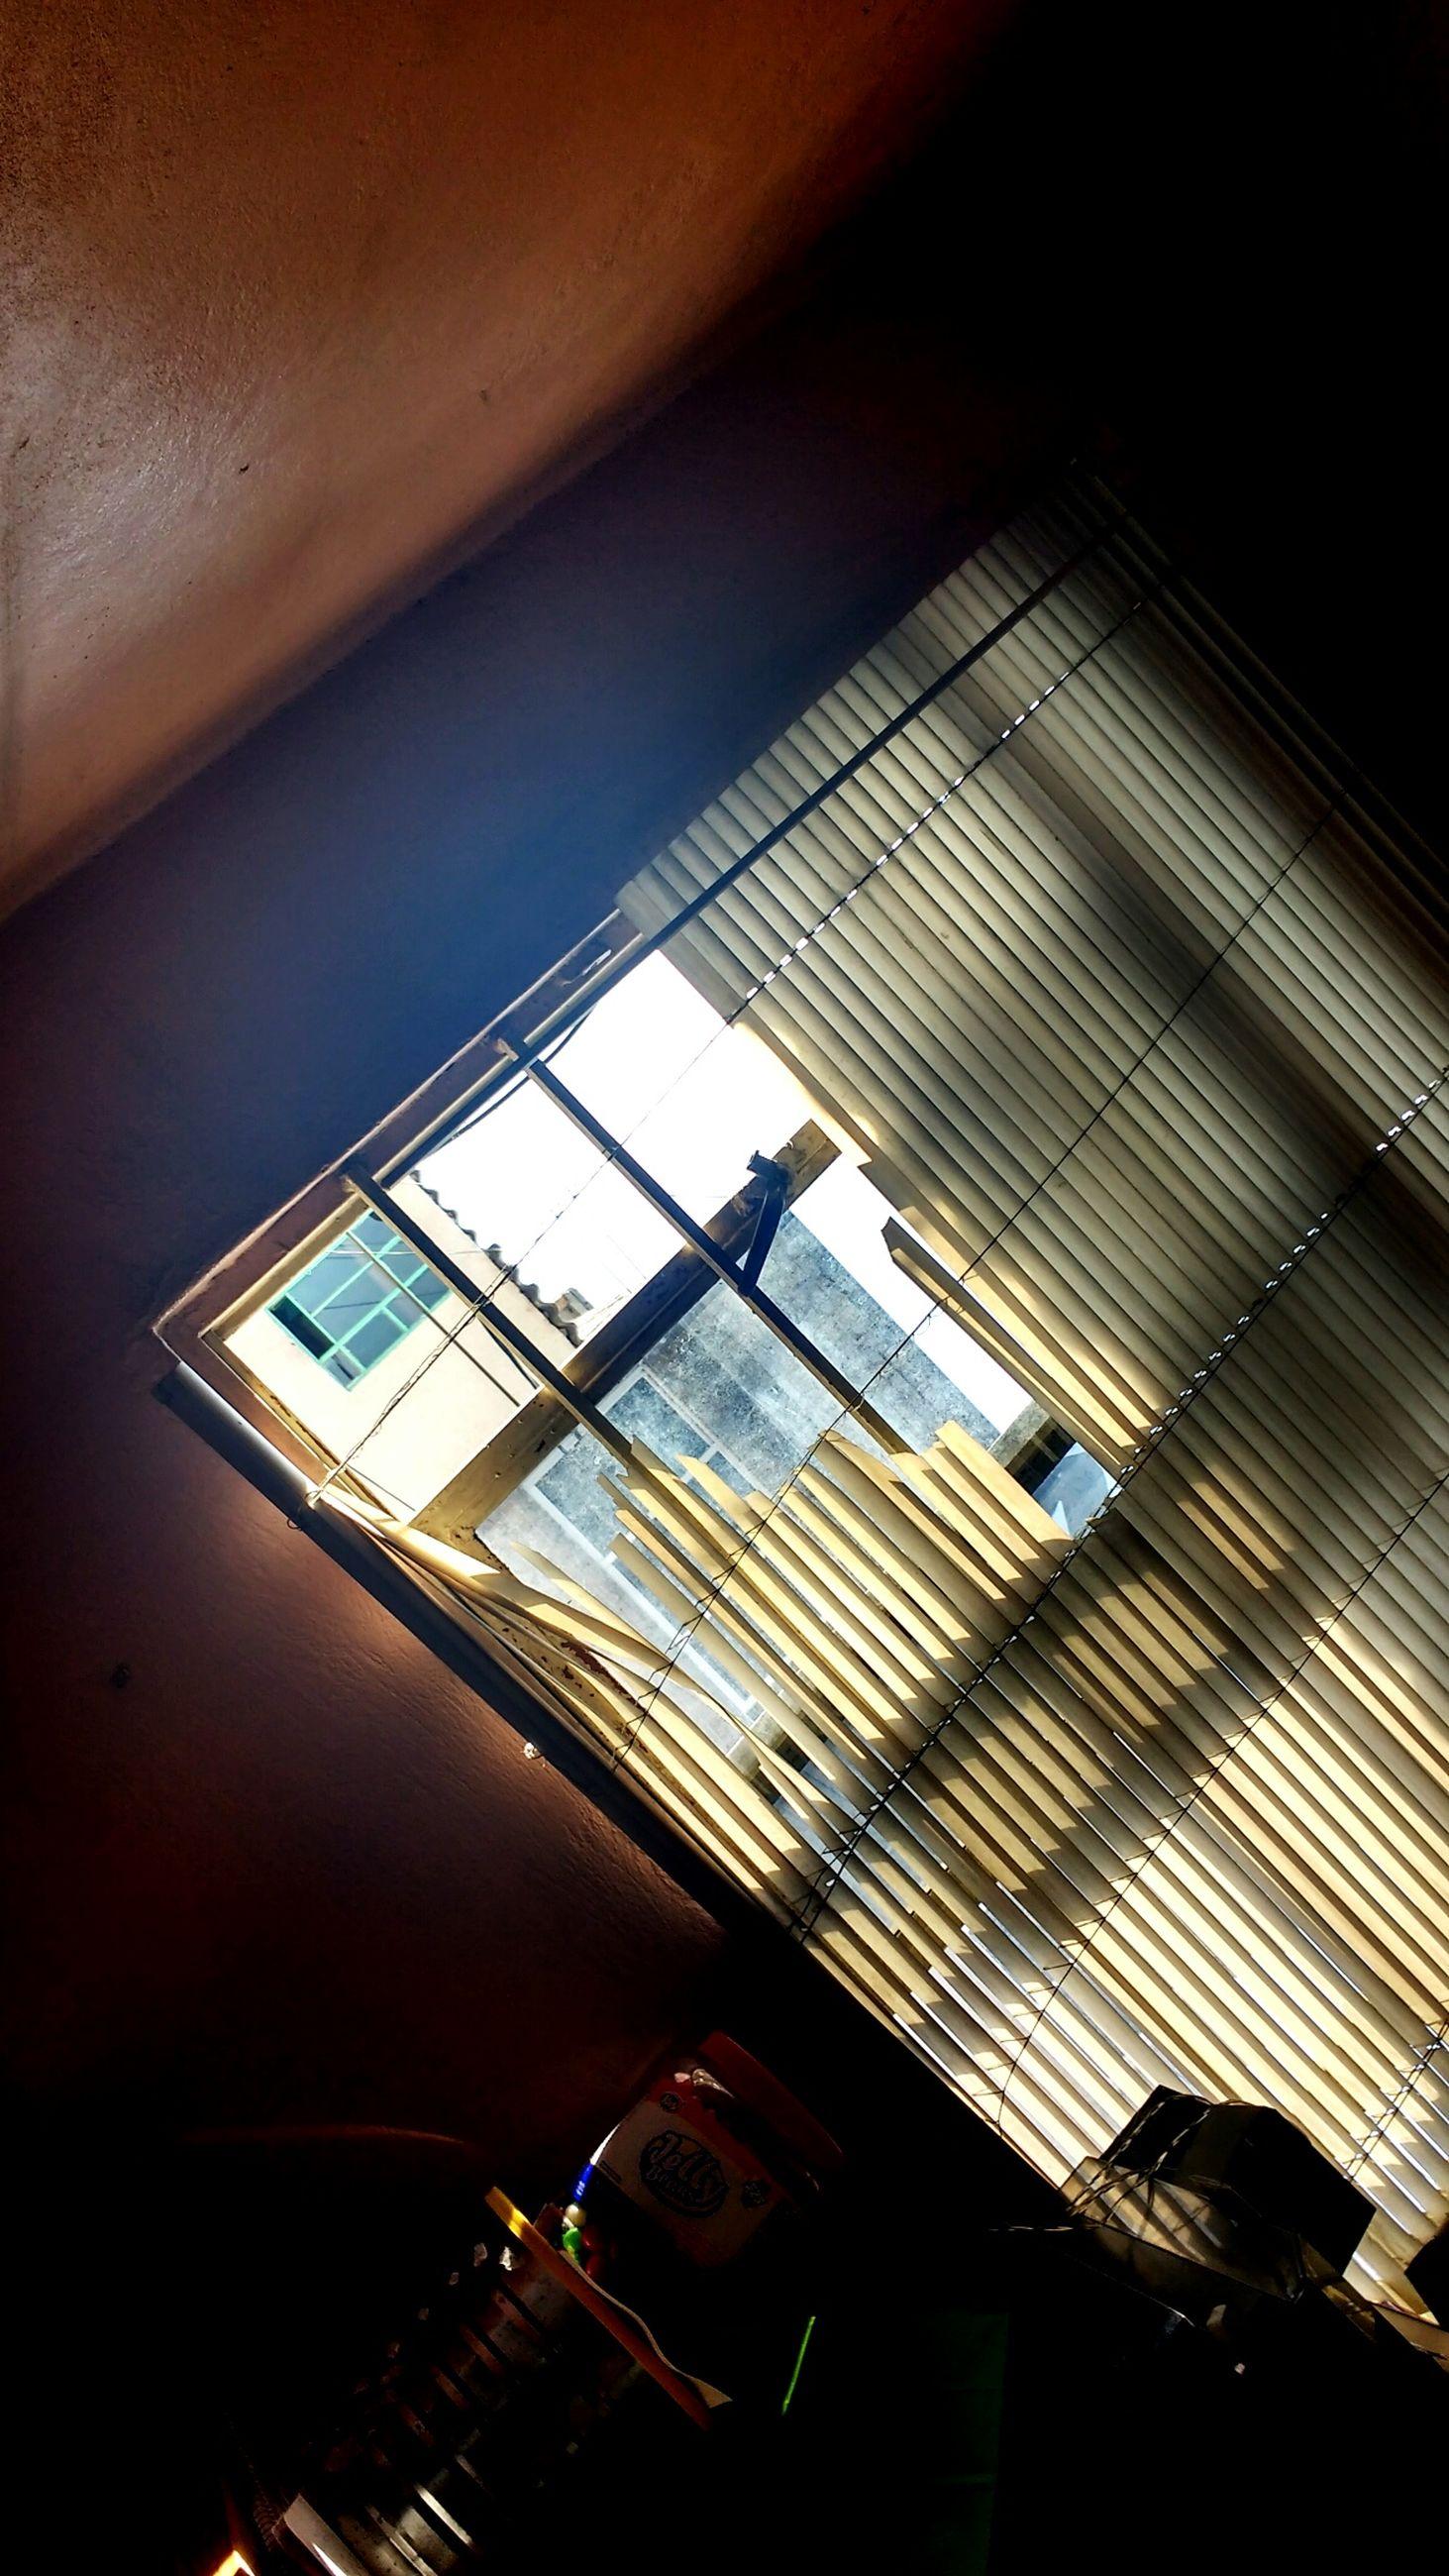 no people, communication, indoors, illuminated, technology, close-up, day